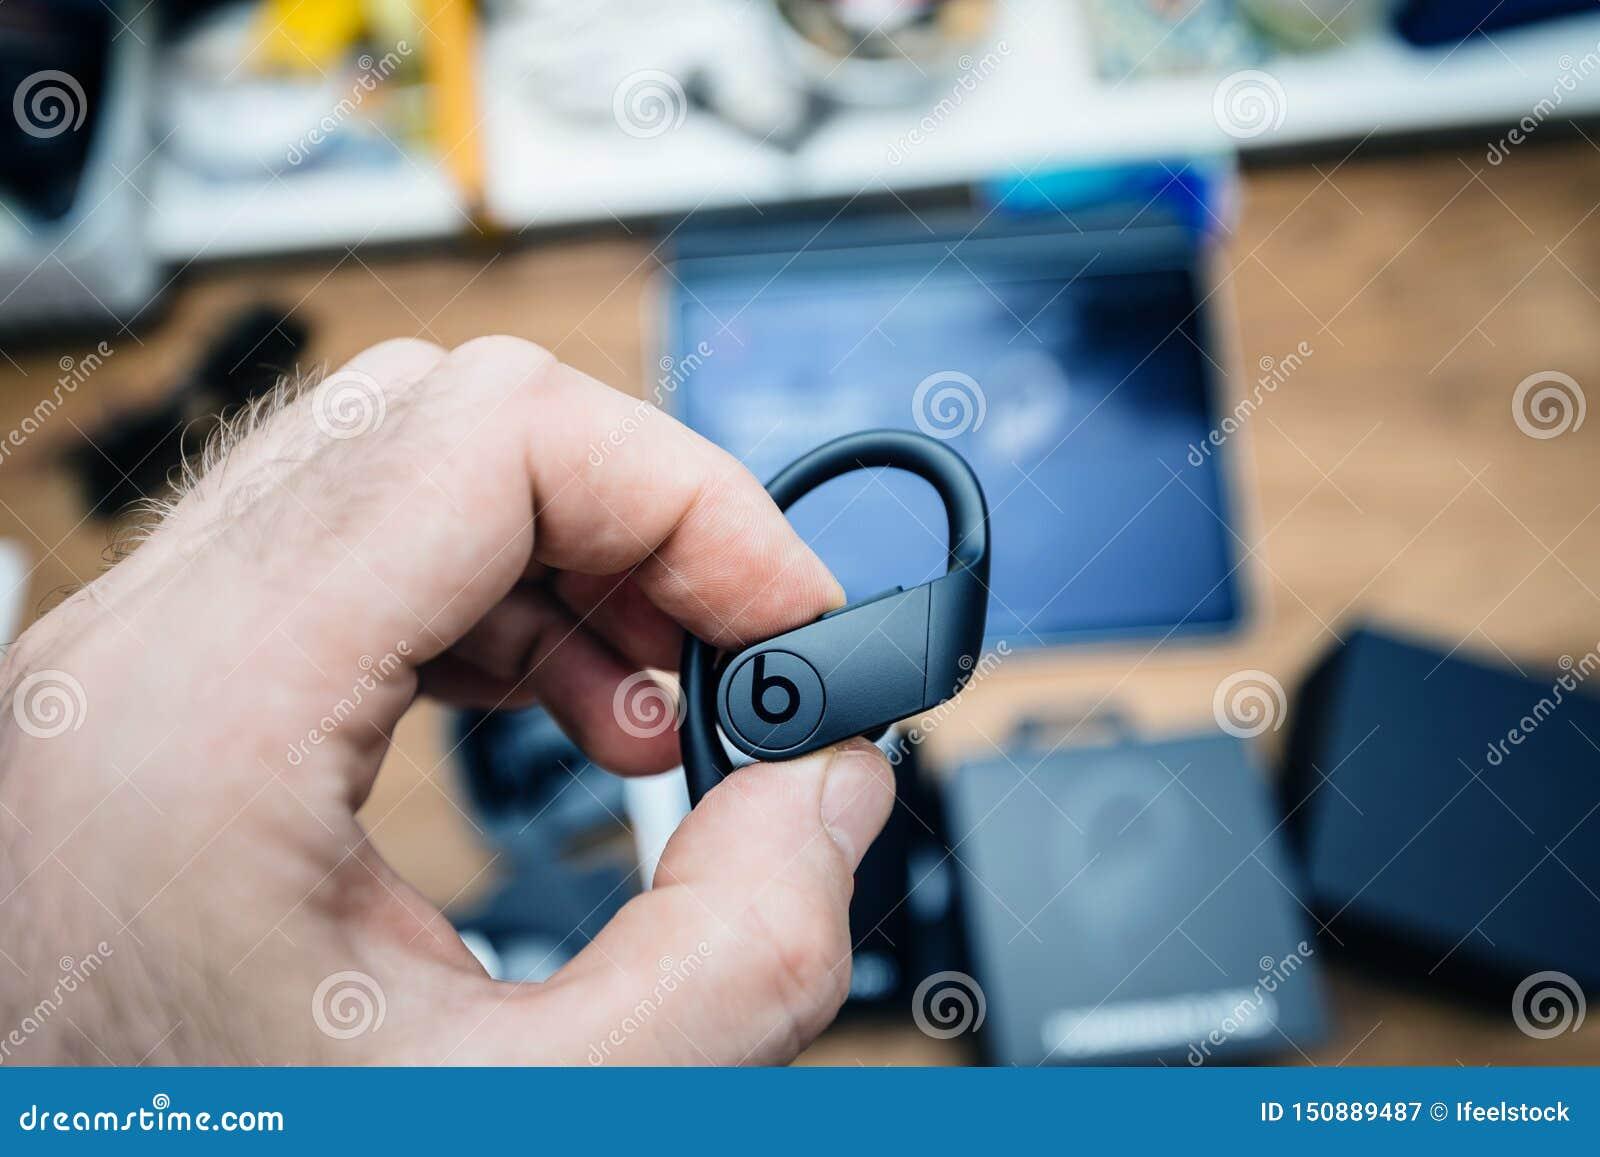 Man hand holding Powerbeats Pro headphone with logotype insignia